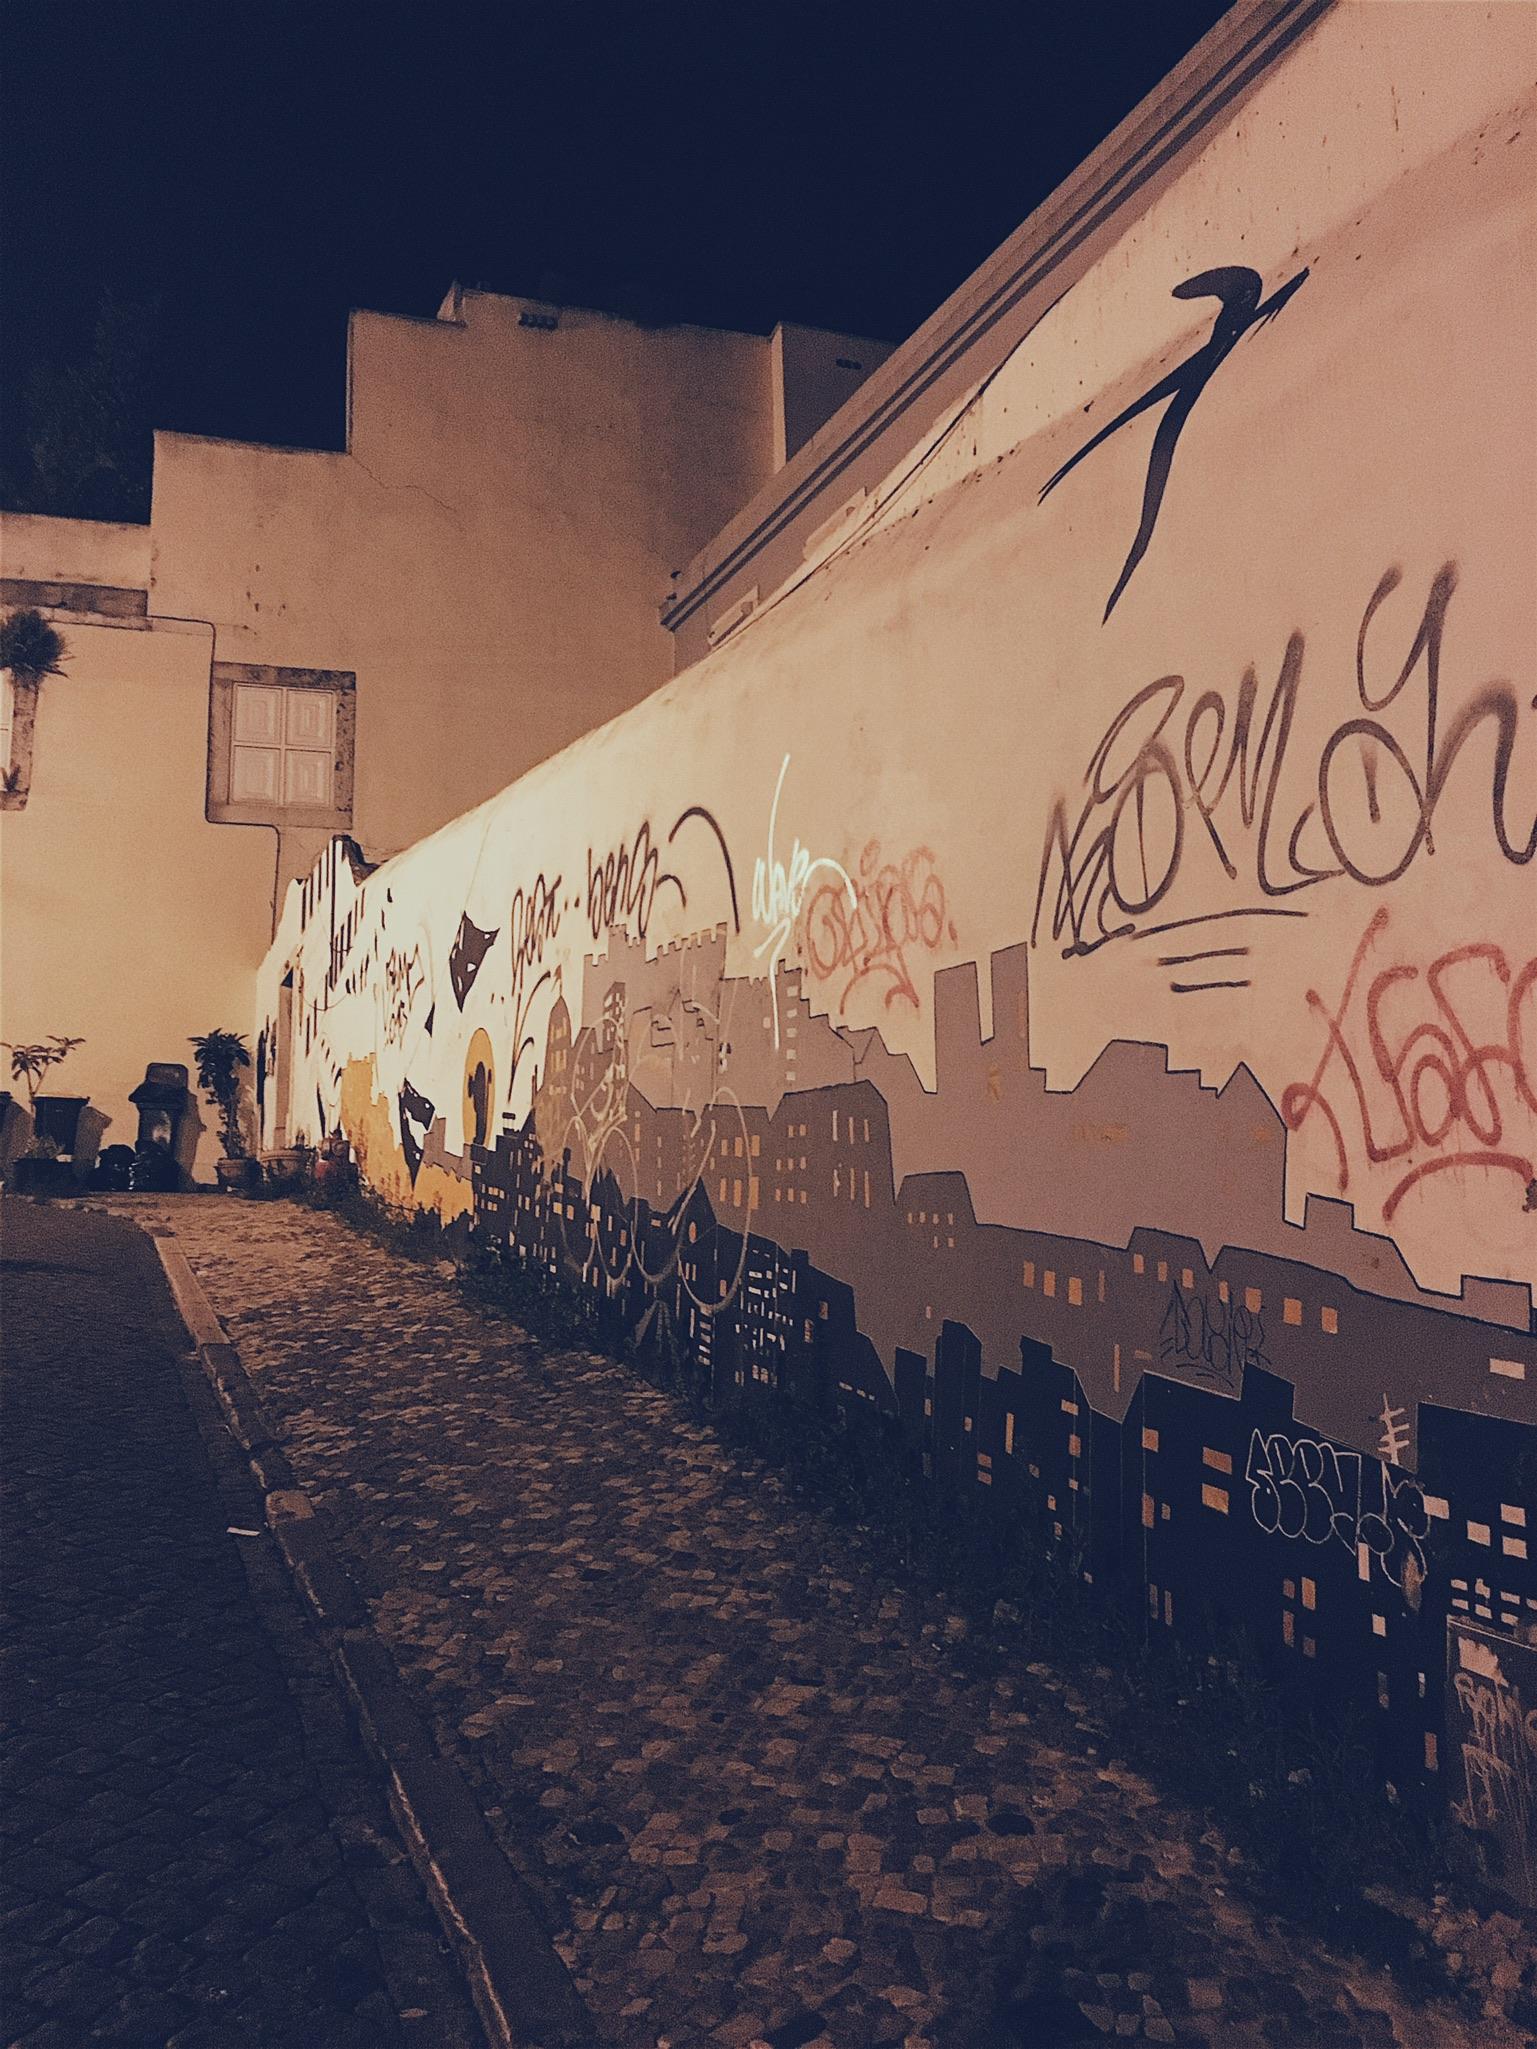 Street art everywhere makes for interesting walks home